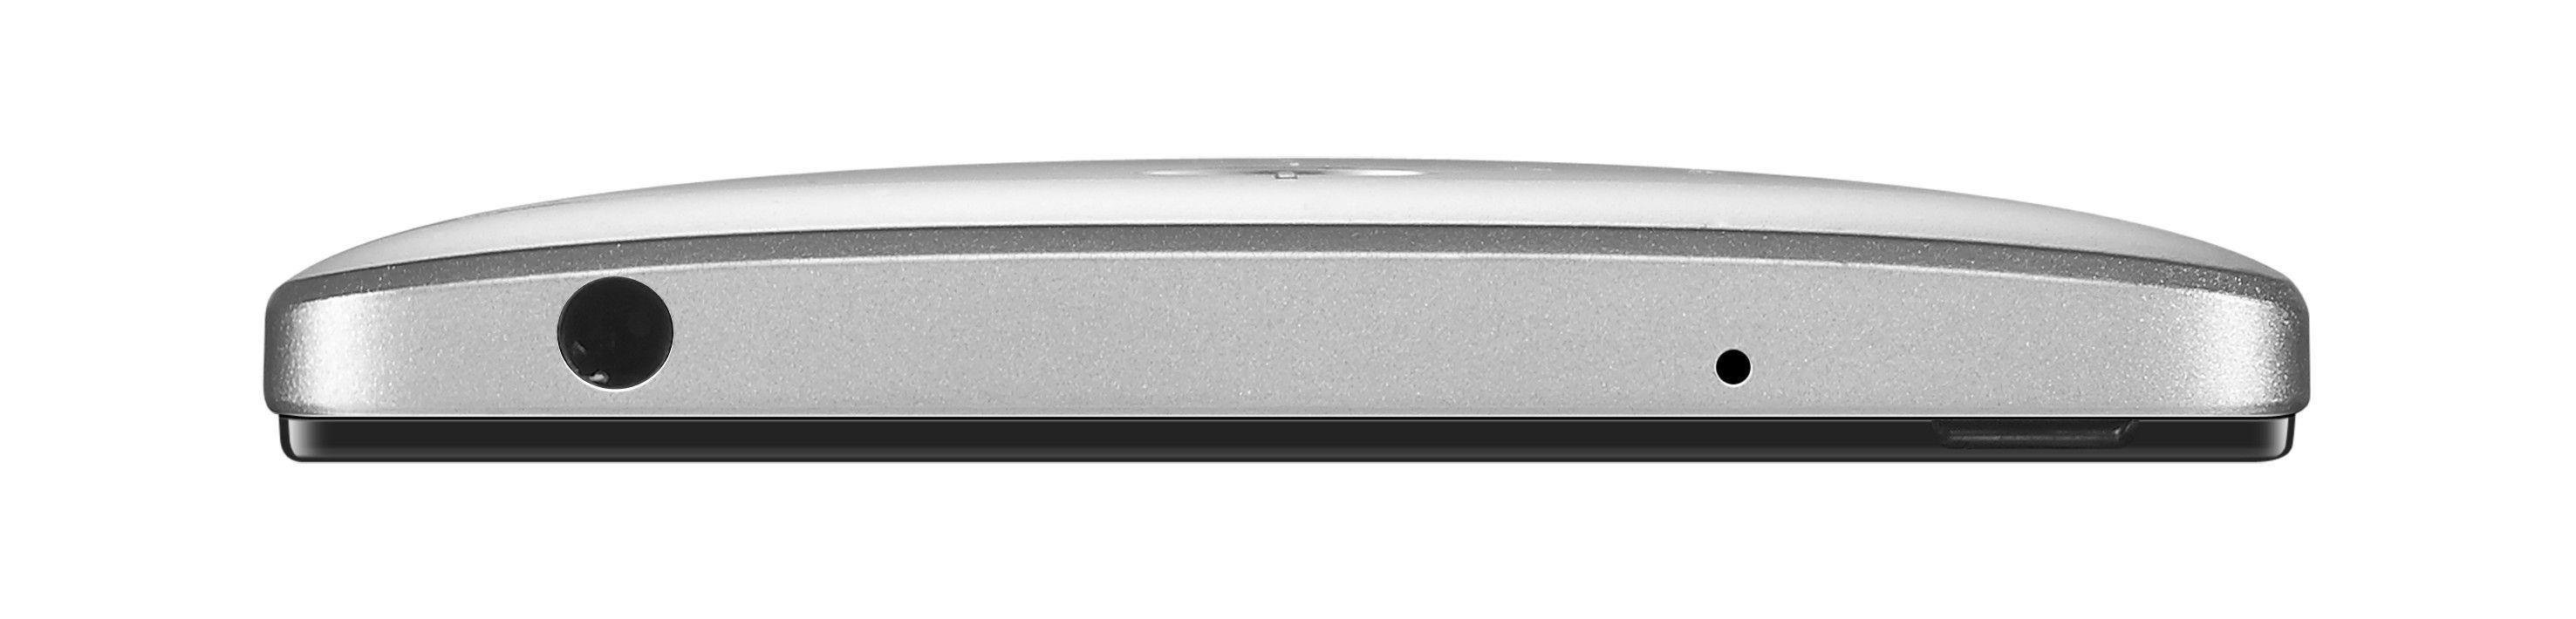 Мобильный телефон Lenovo VIBE P1 Silver - 2